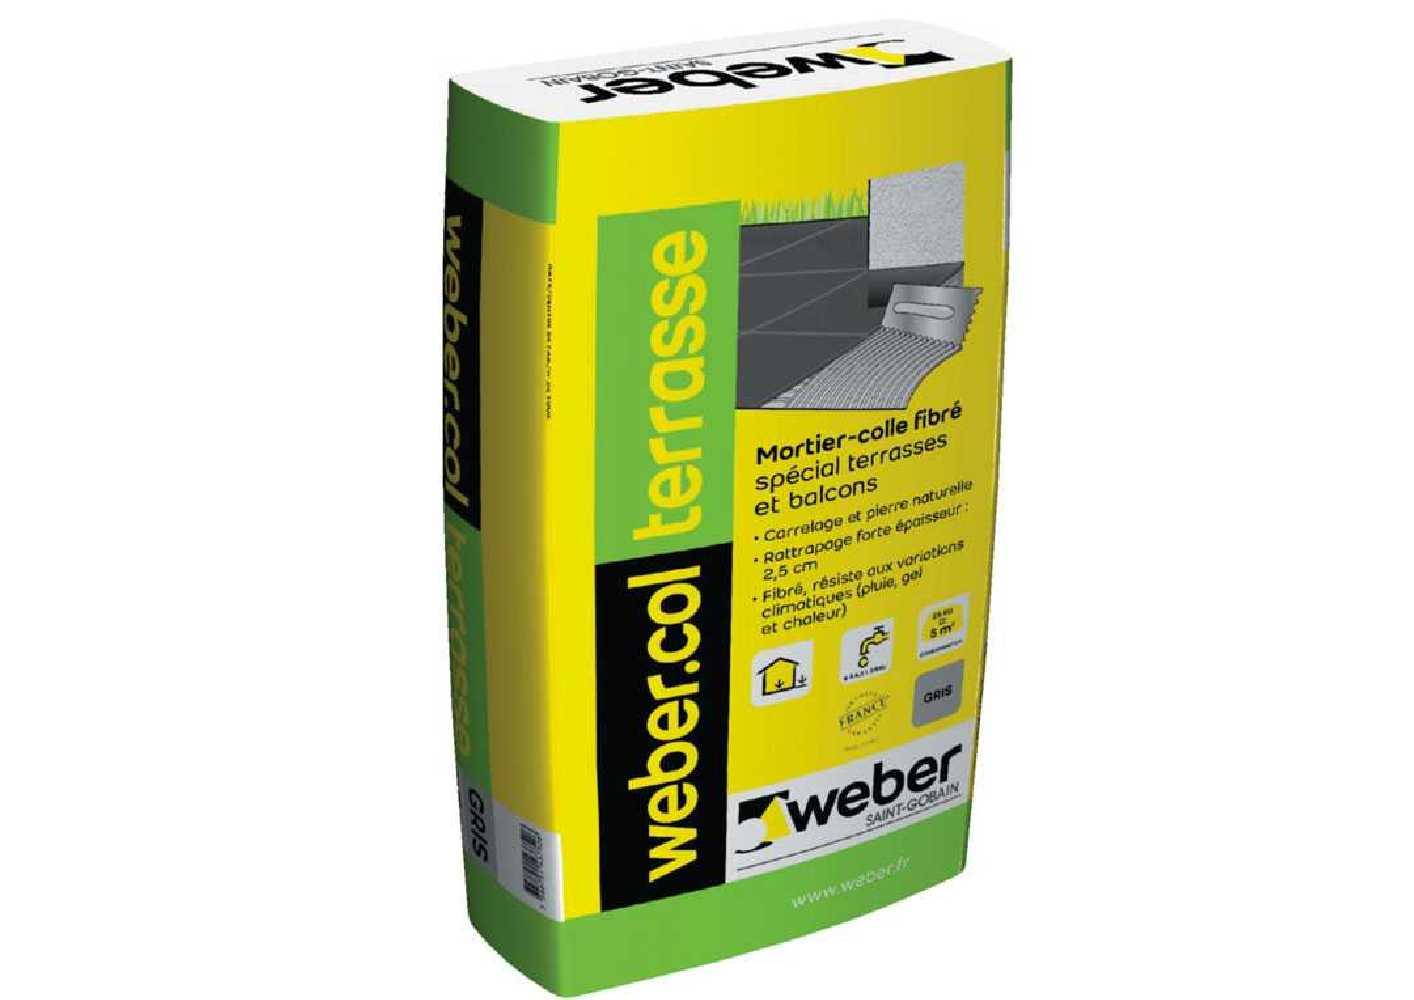 Weber.col terrasse gris - sac de 25kg